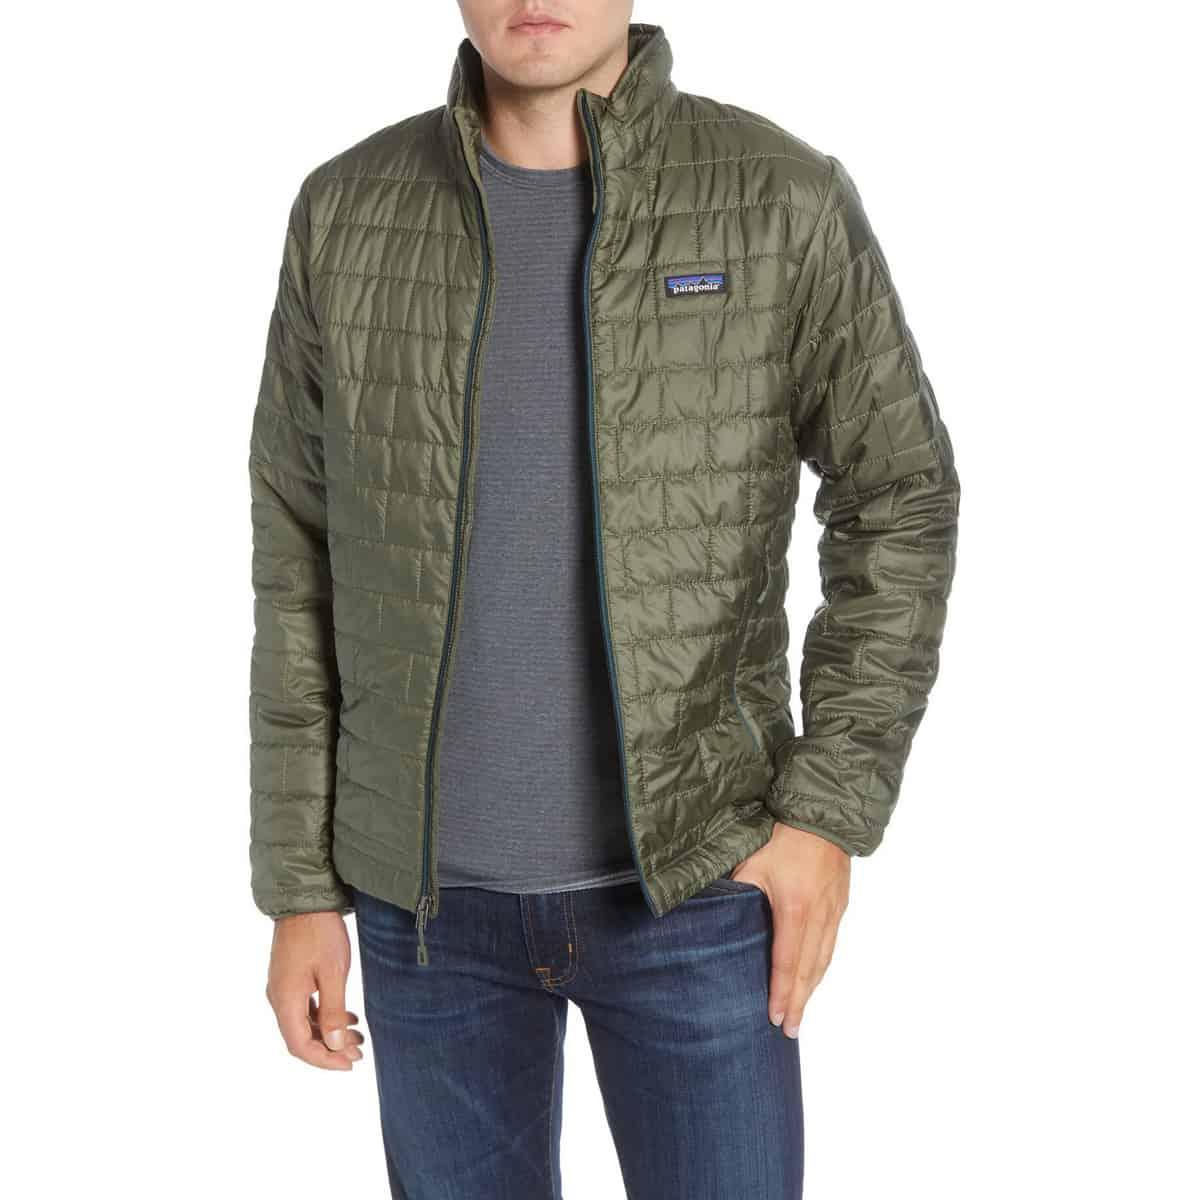 Patagonia-Nano-Puff-Water-Resistant-Jacket